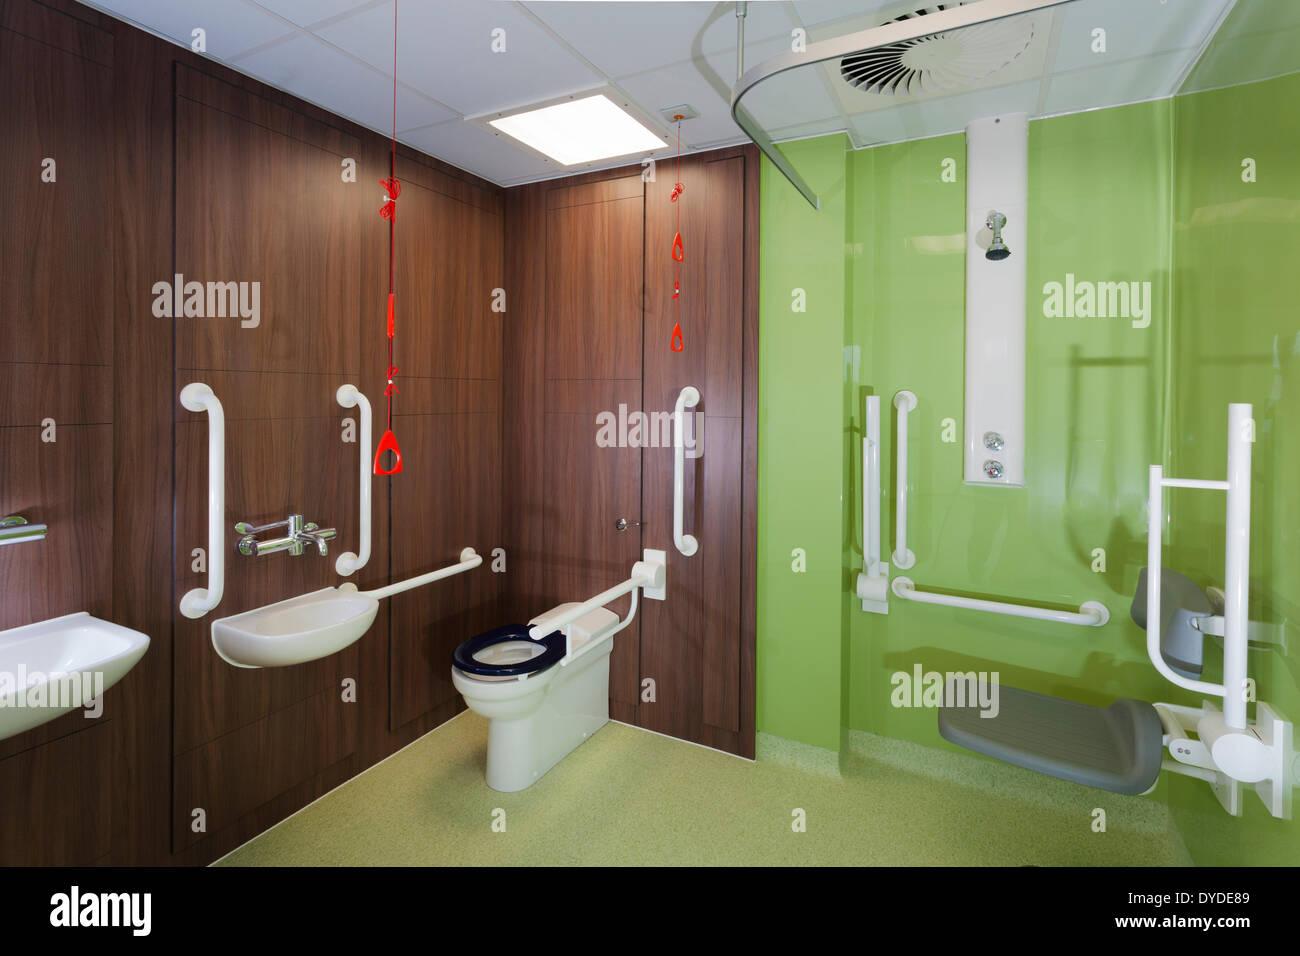 Internal Bathroom Stock Photos & Internal Bathroom Stock Images - Alamy